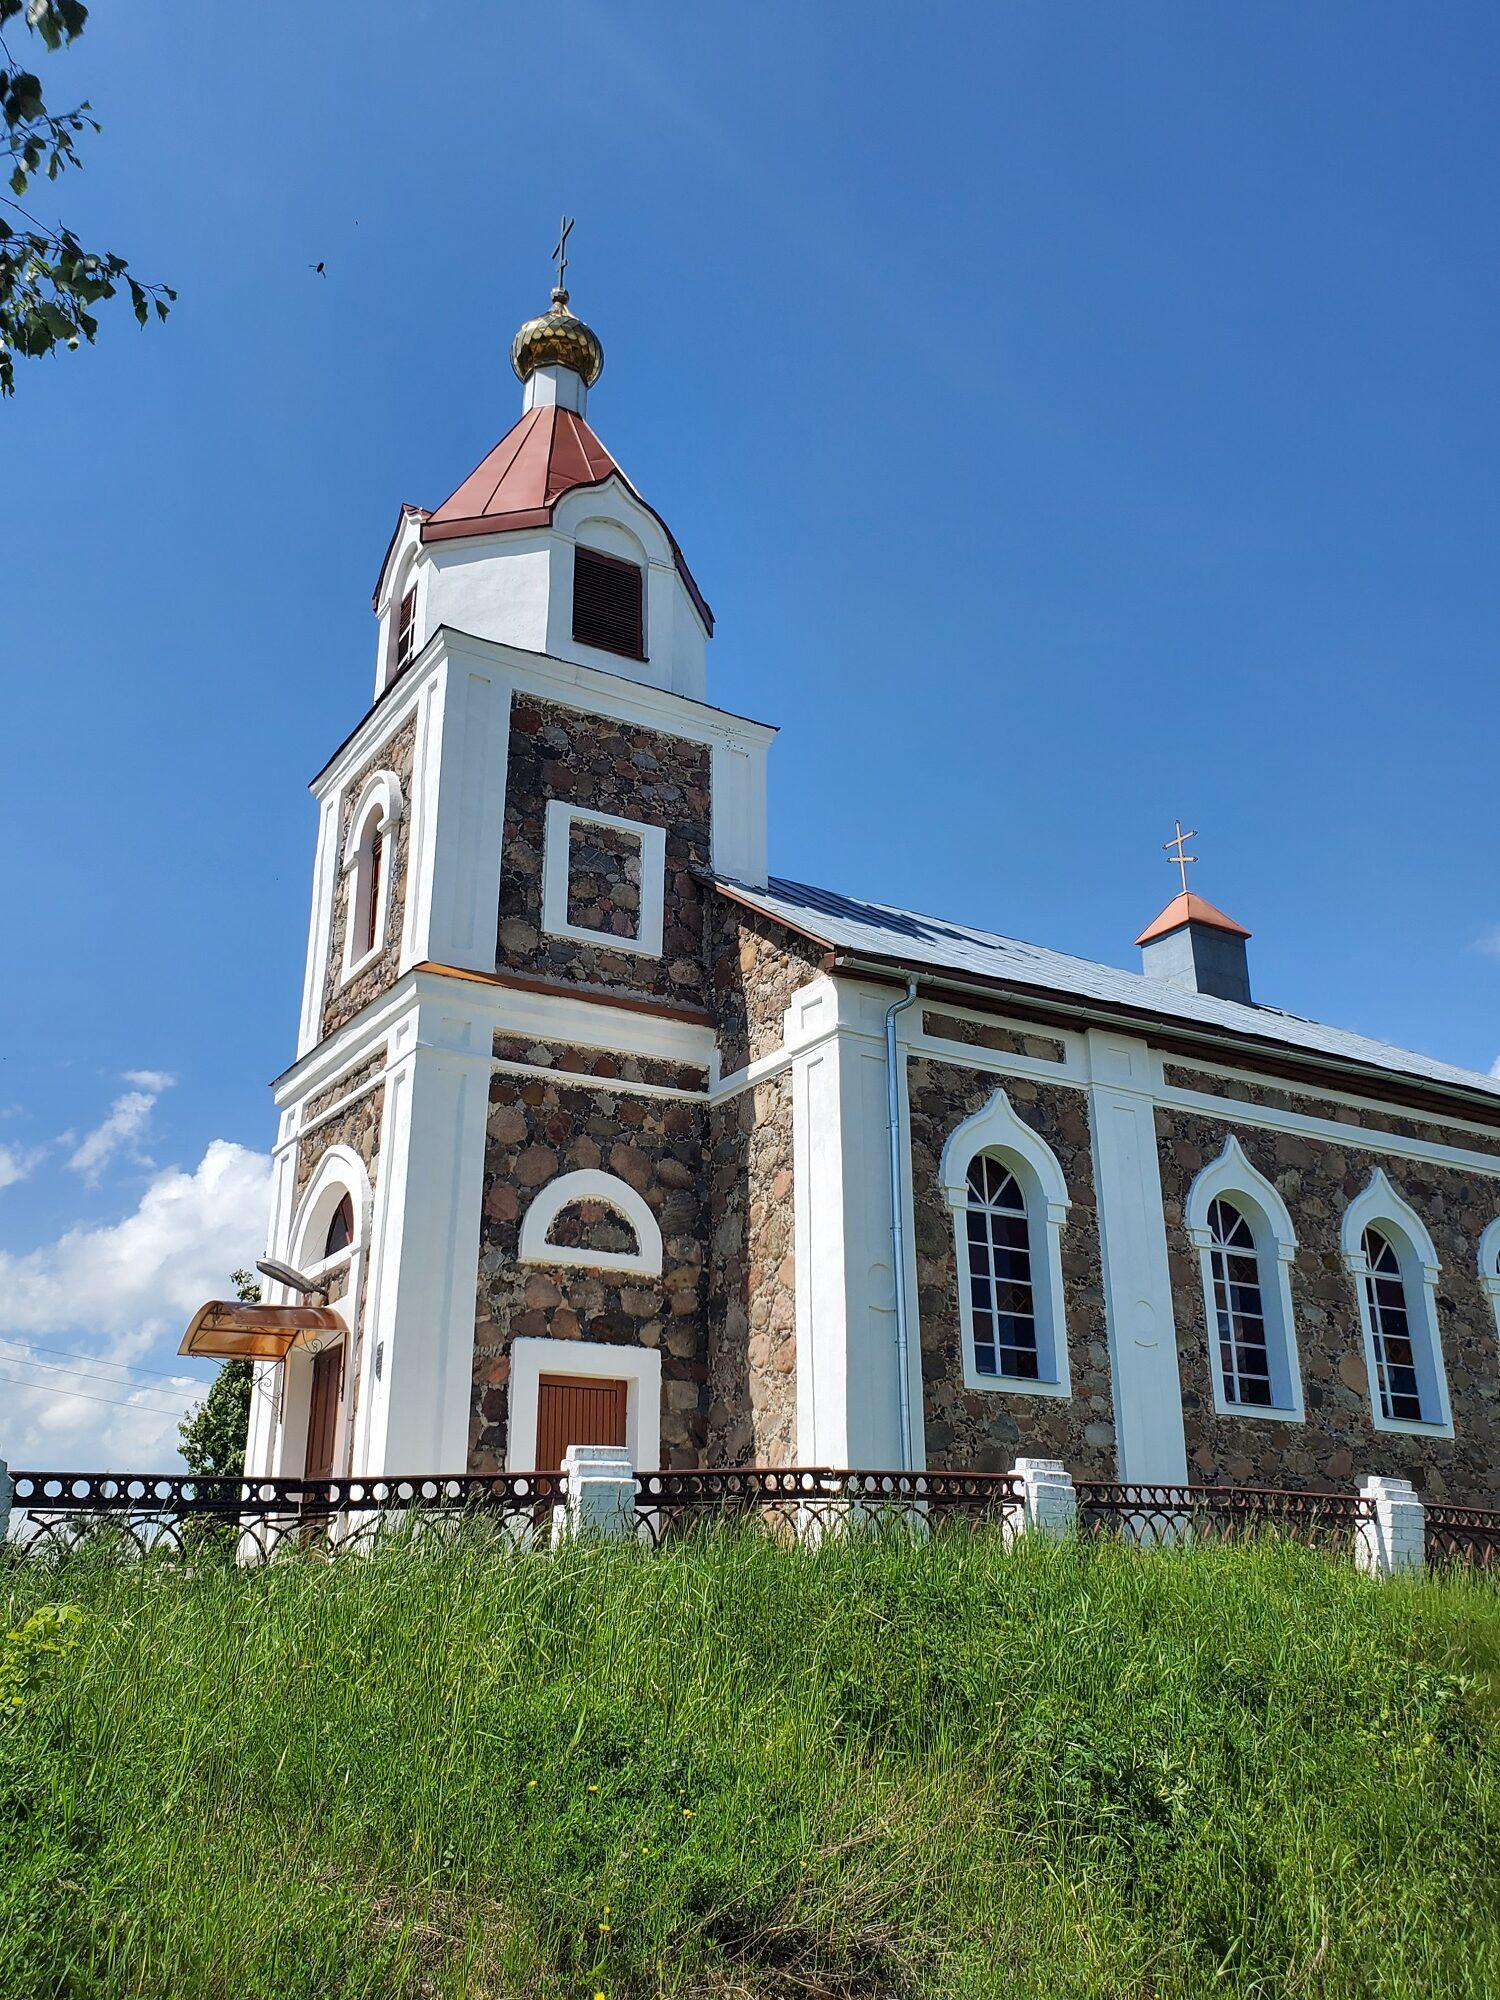 20200606 140841 rotated - Храм Рождества Иоанна Предтечи в деревне Груздово